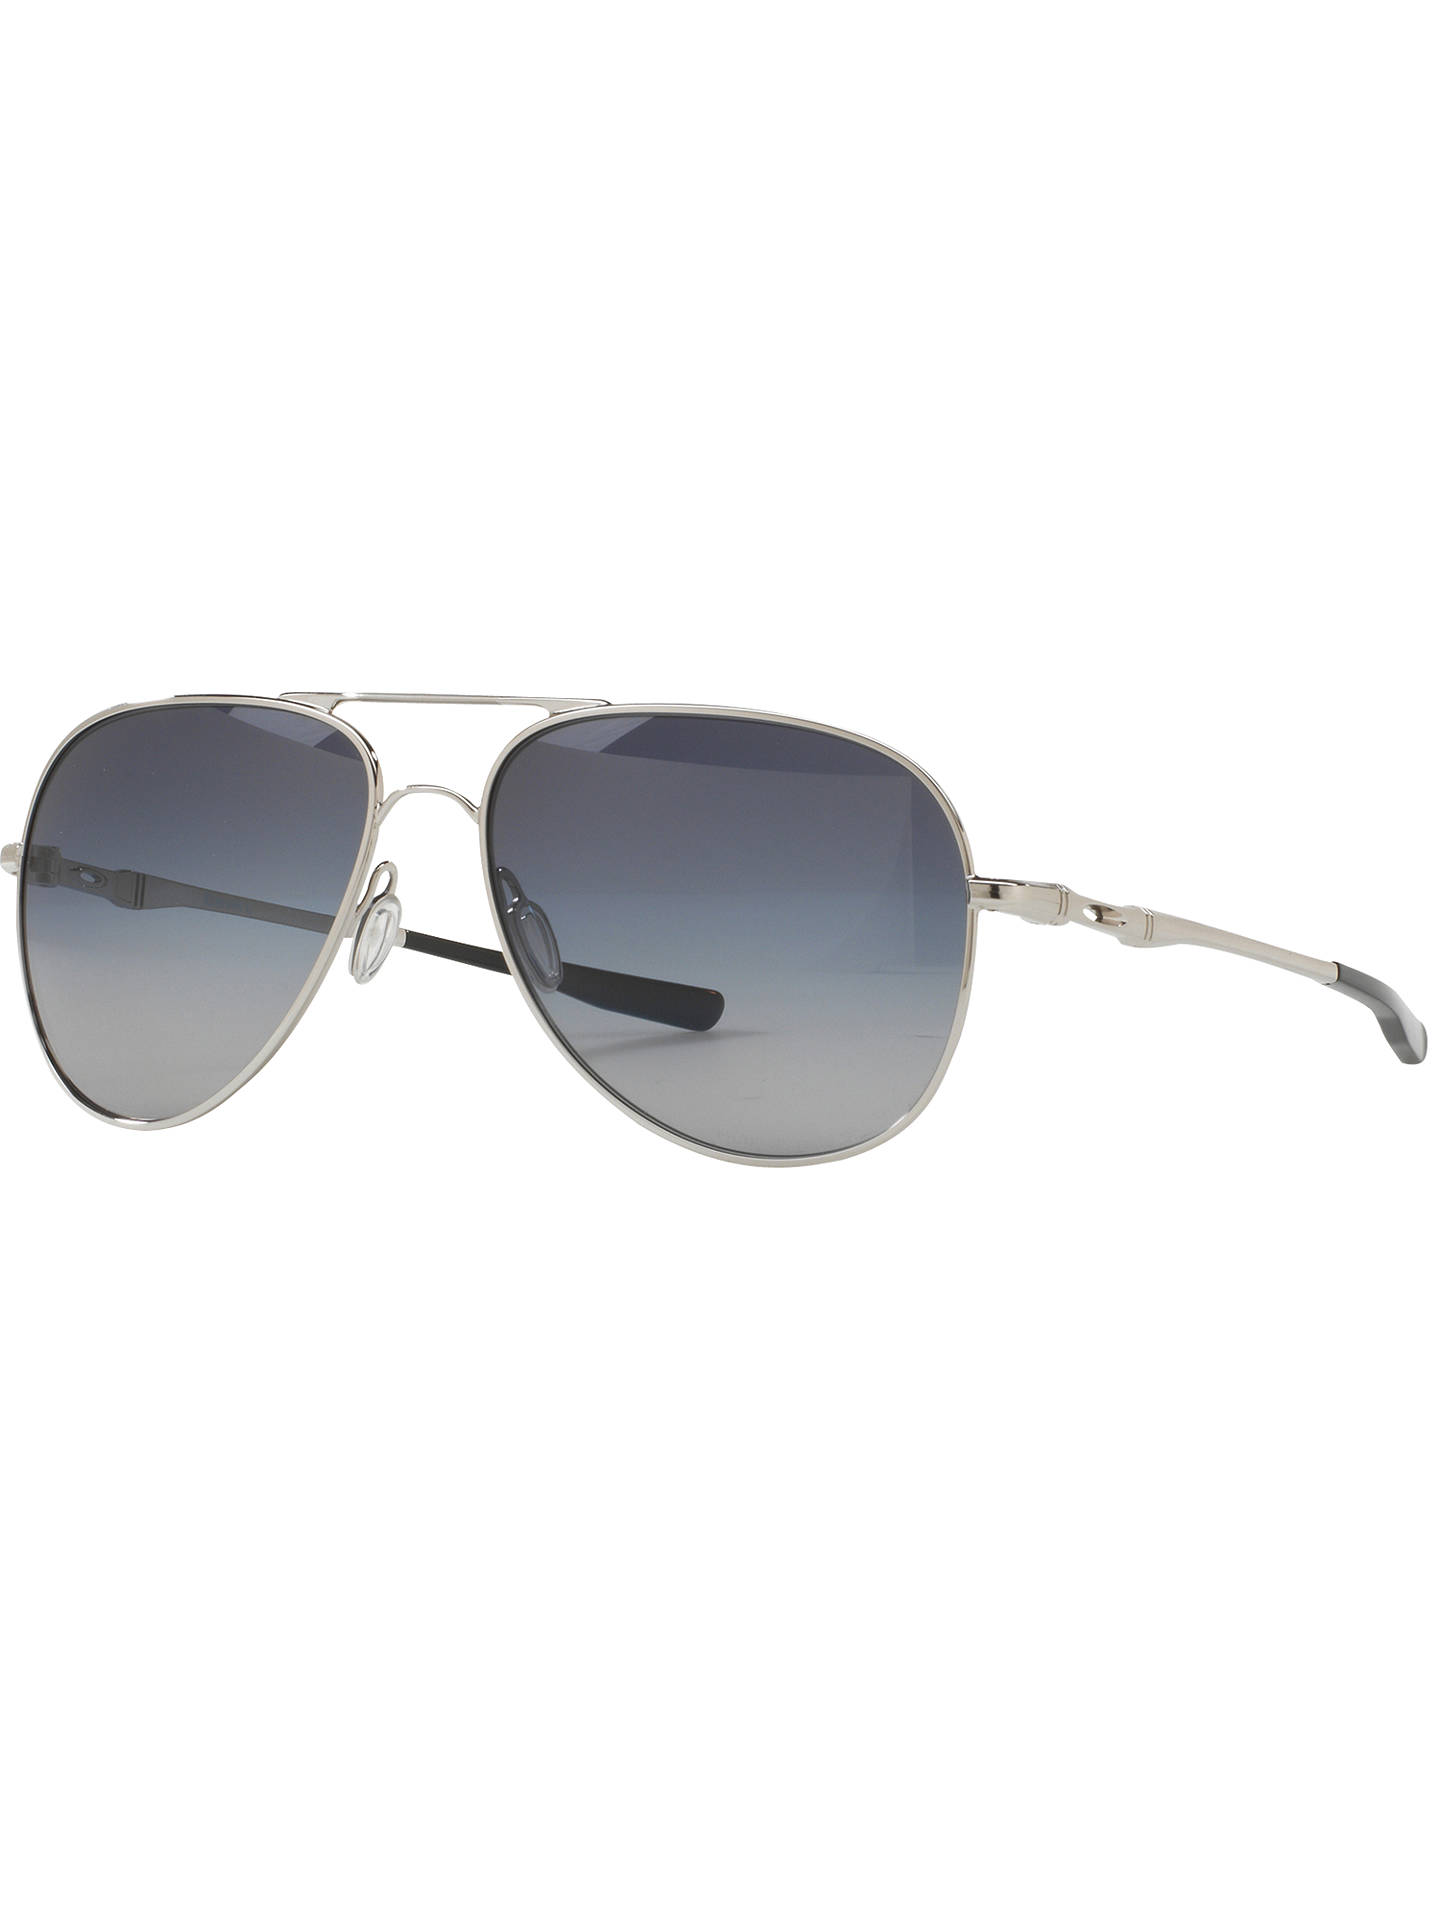 1291e27e38b BuyOakley OO4119 Elmont Medium Polarised Aviator Sunglasses